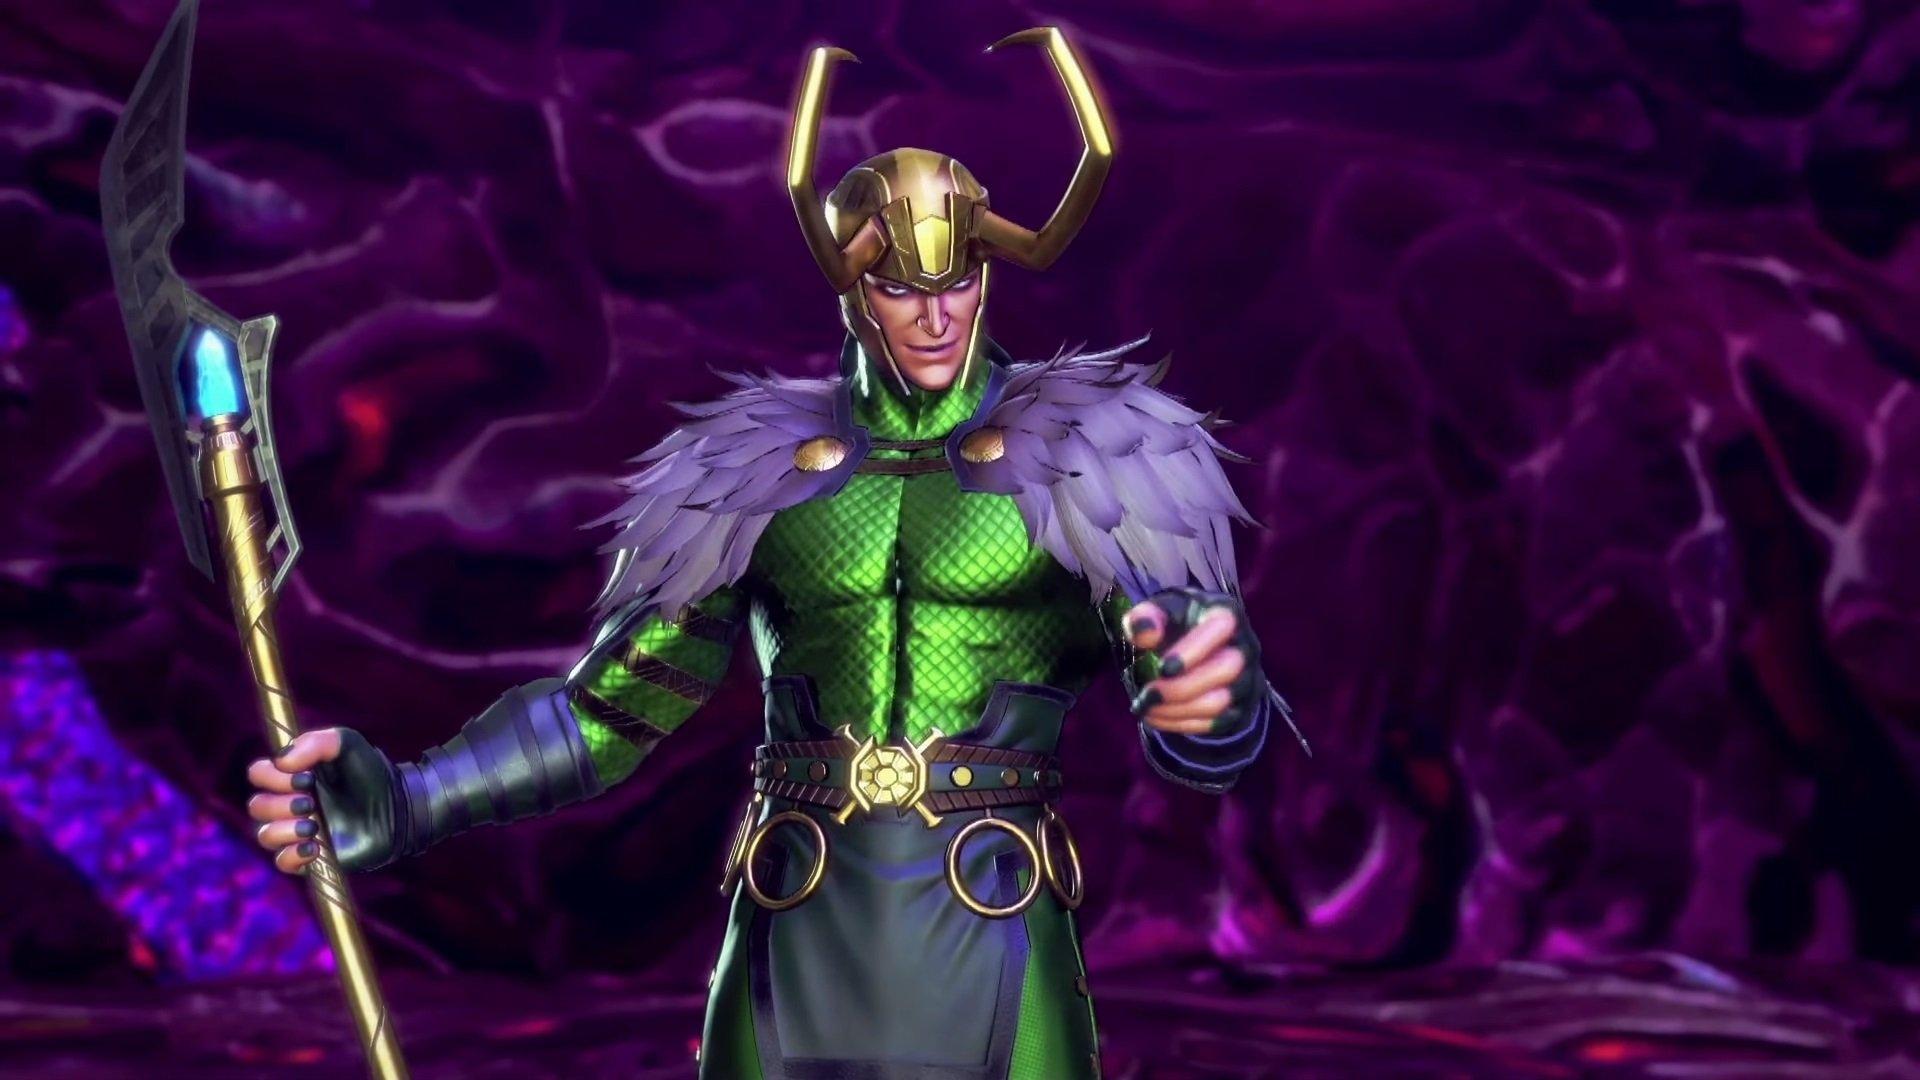 Како да се отвори Loki Marvel Ultimate Alliance 3